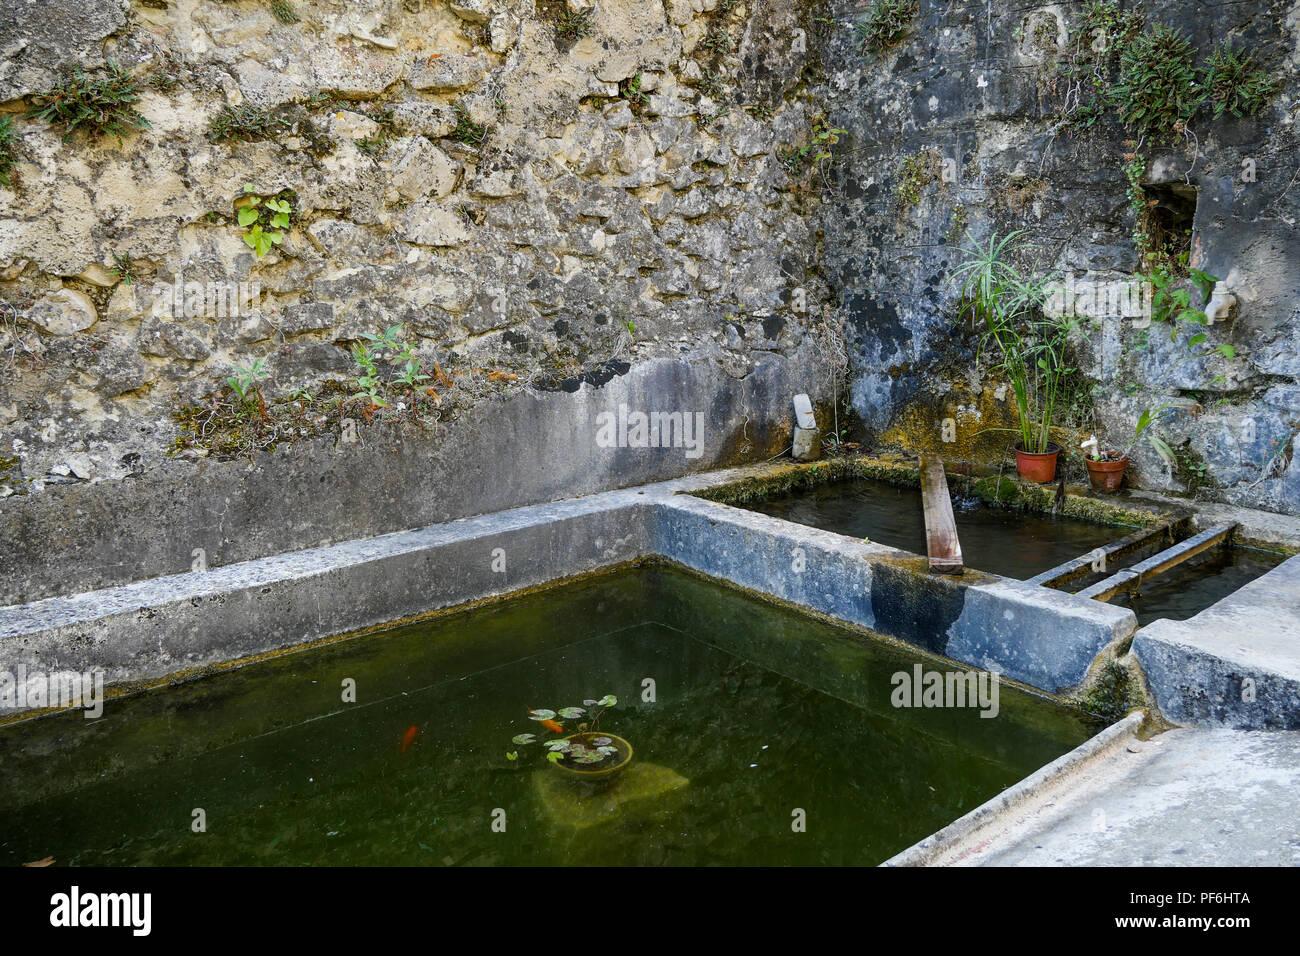 Washtub, Félines, Drome, France - Stock Image